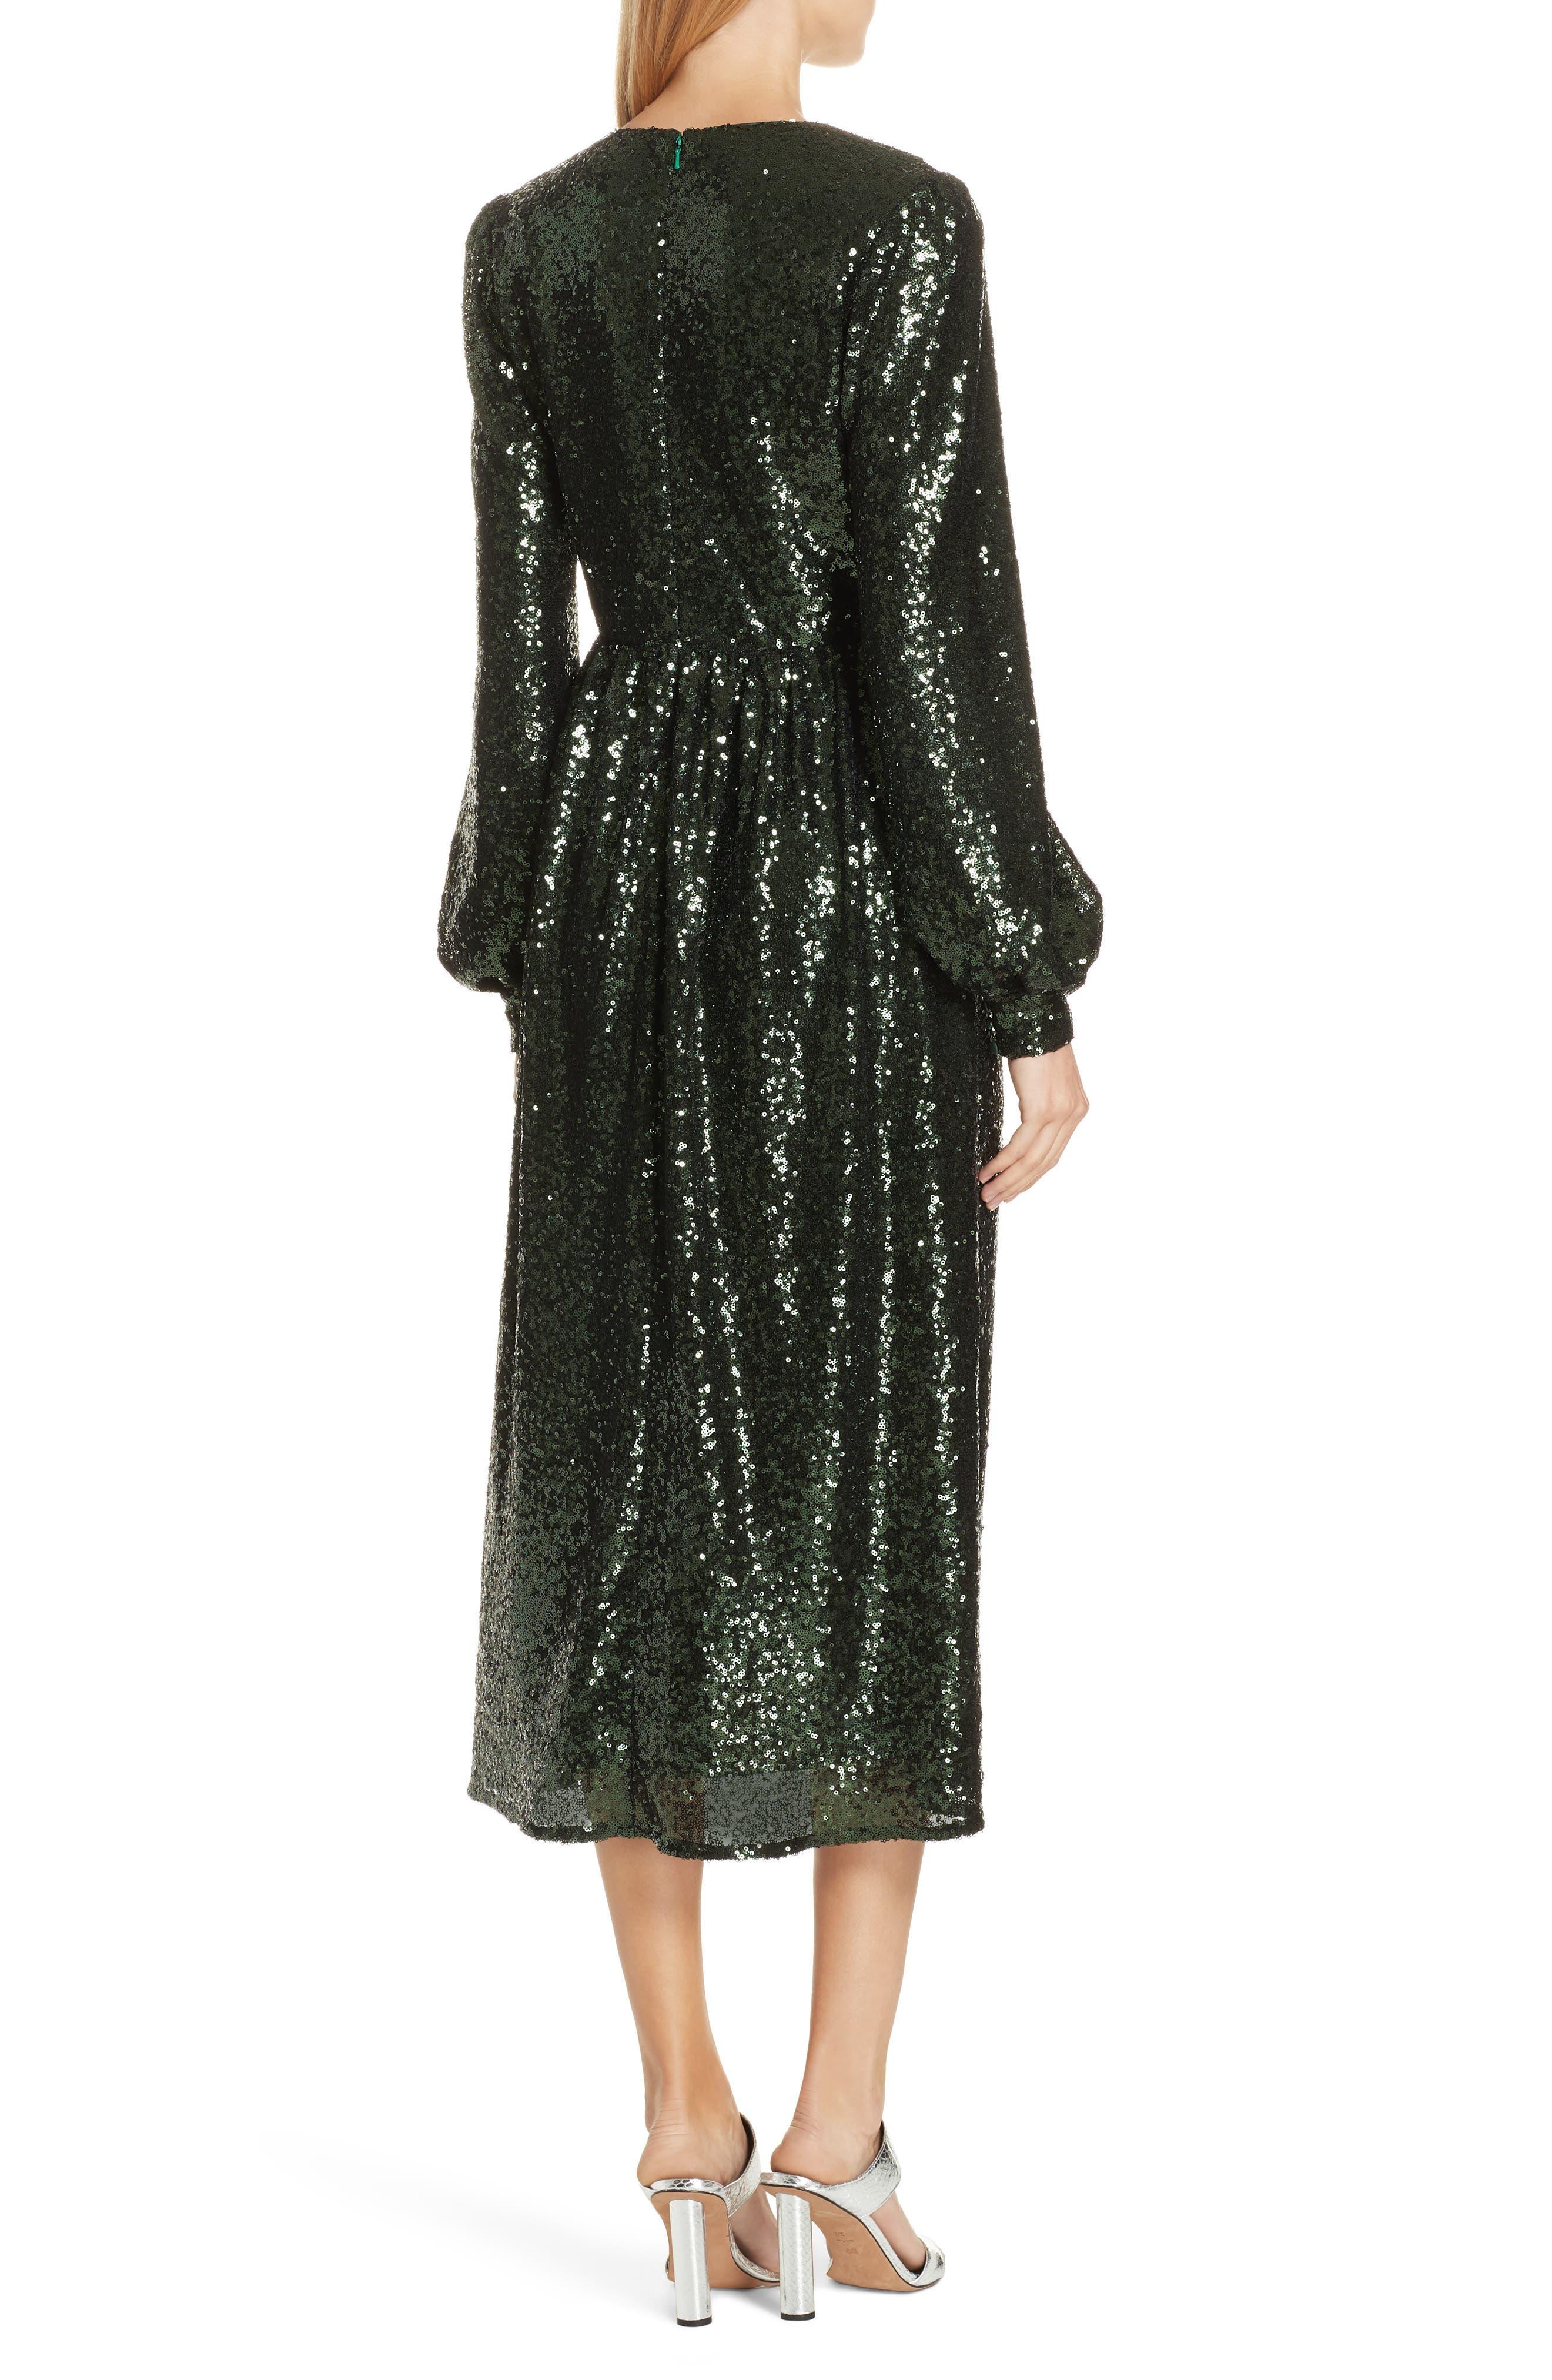 SALONI, Camille Sequin Midi Dress, Alternate thumbnail 2, color, DARK GREEN